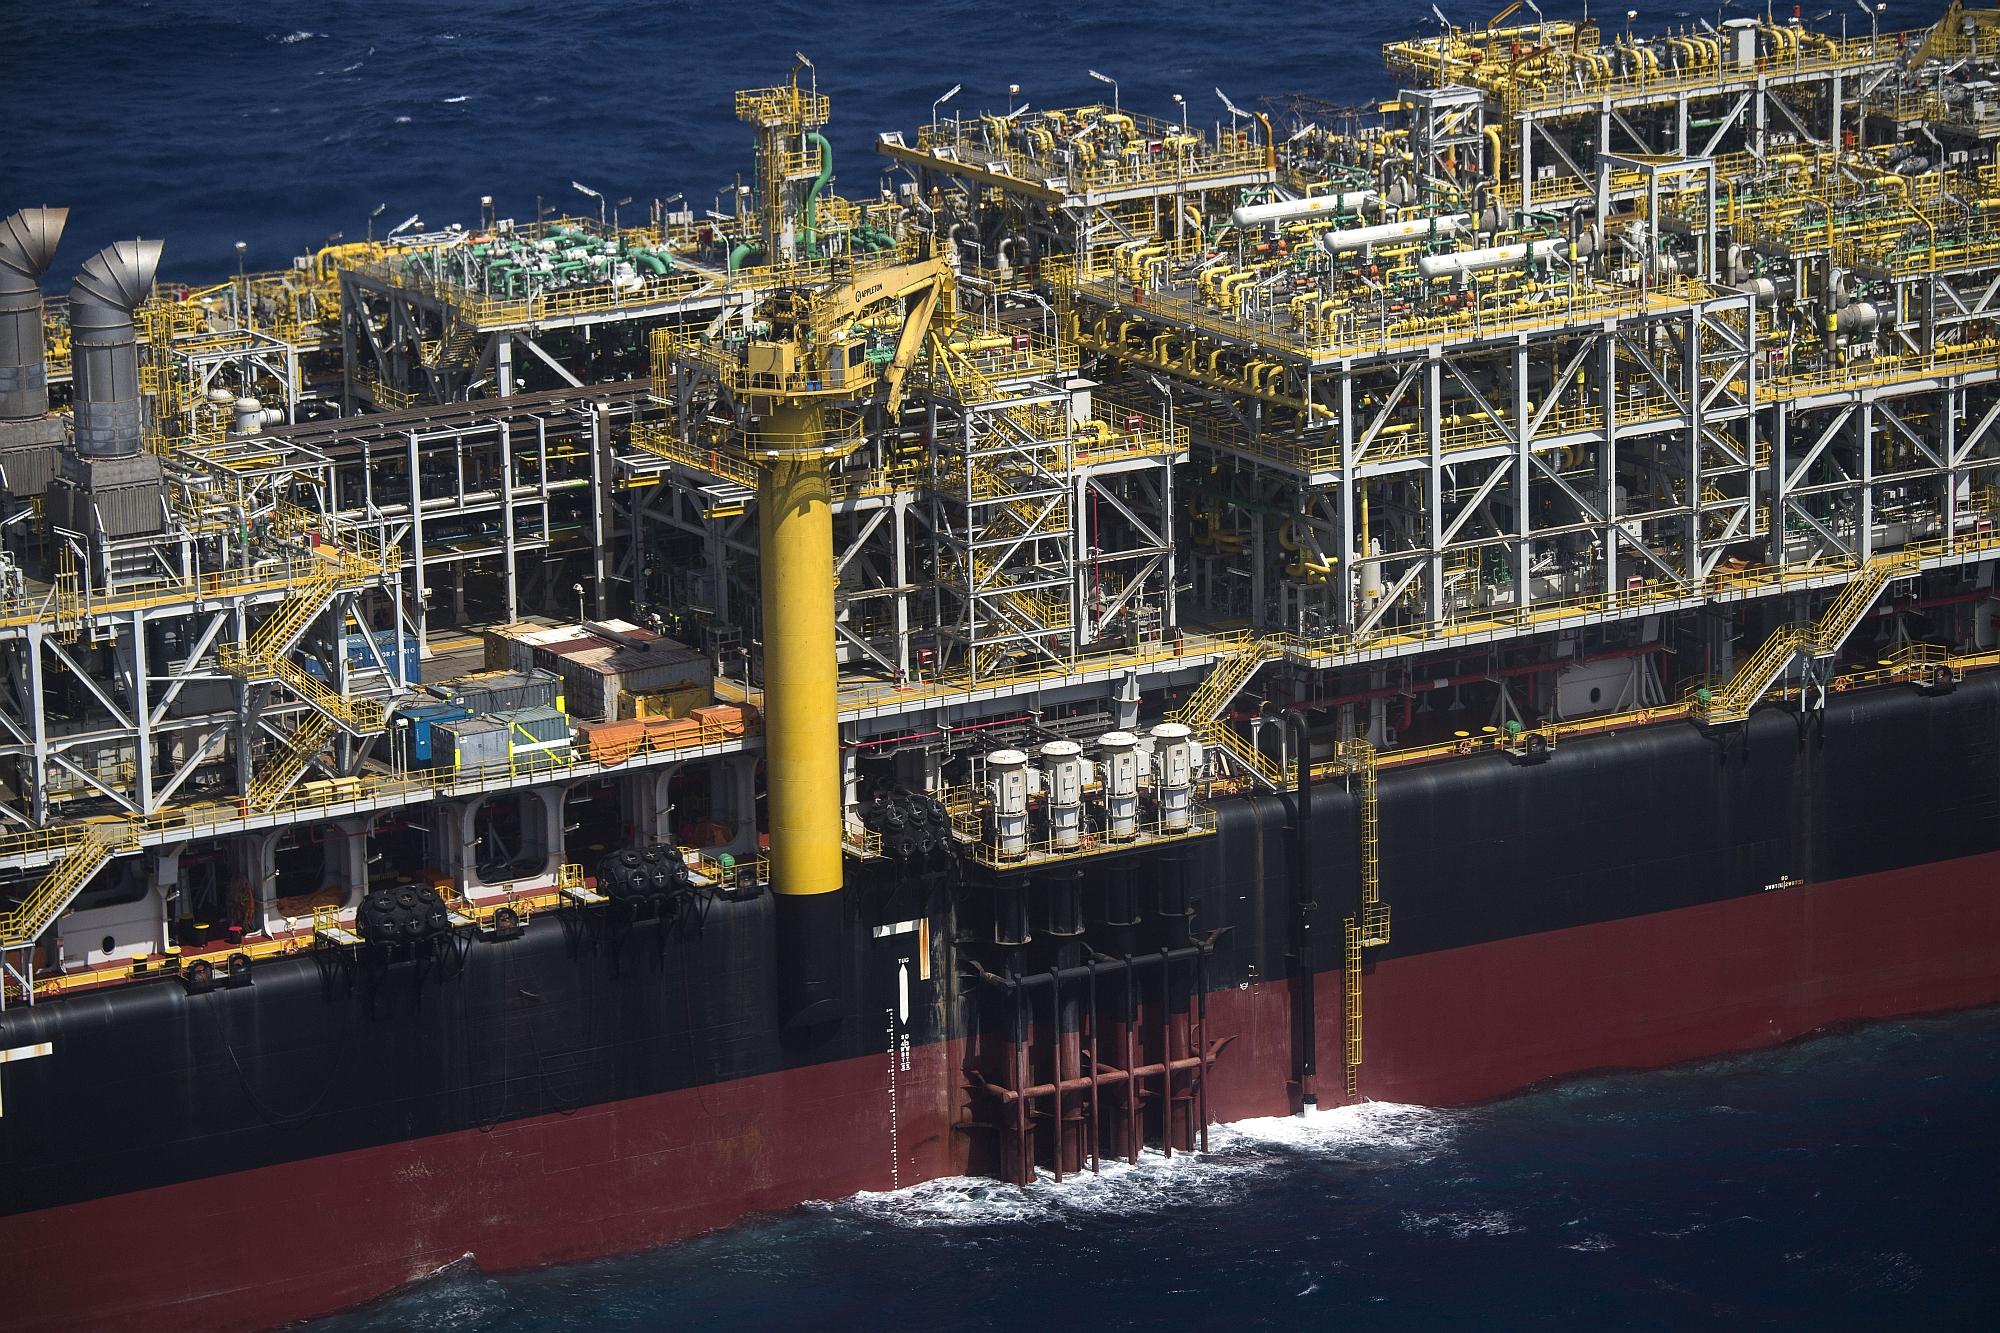 Plataforma de petróleo opera no pré-sal